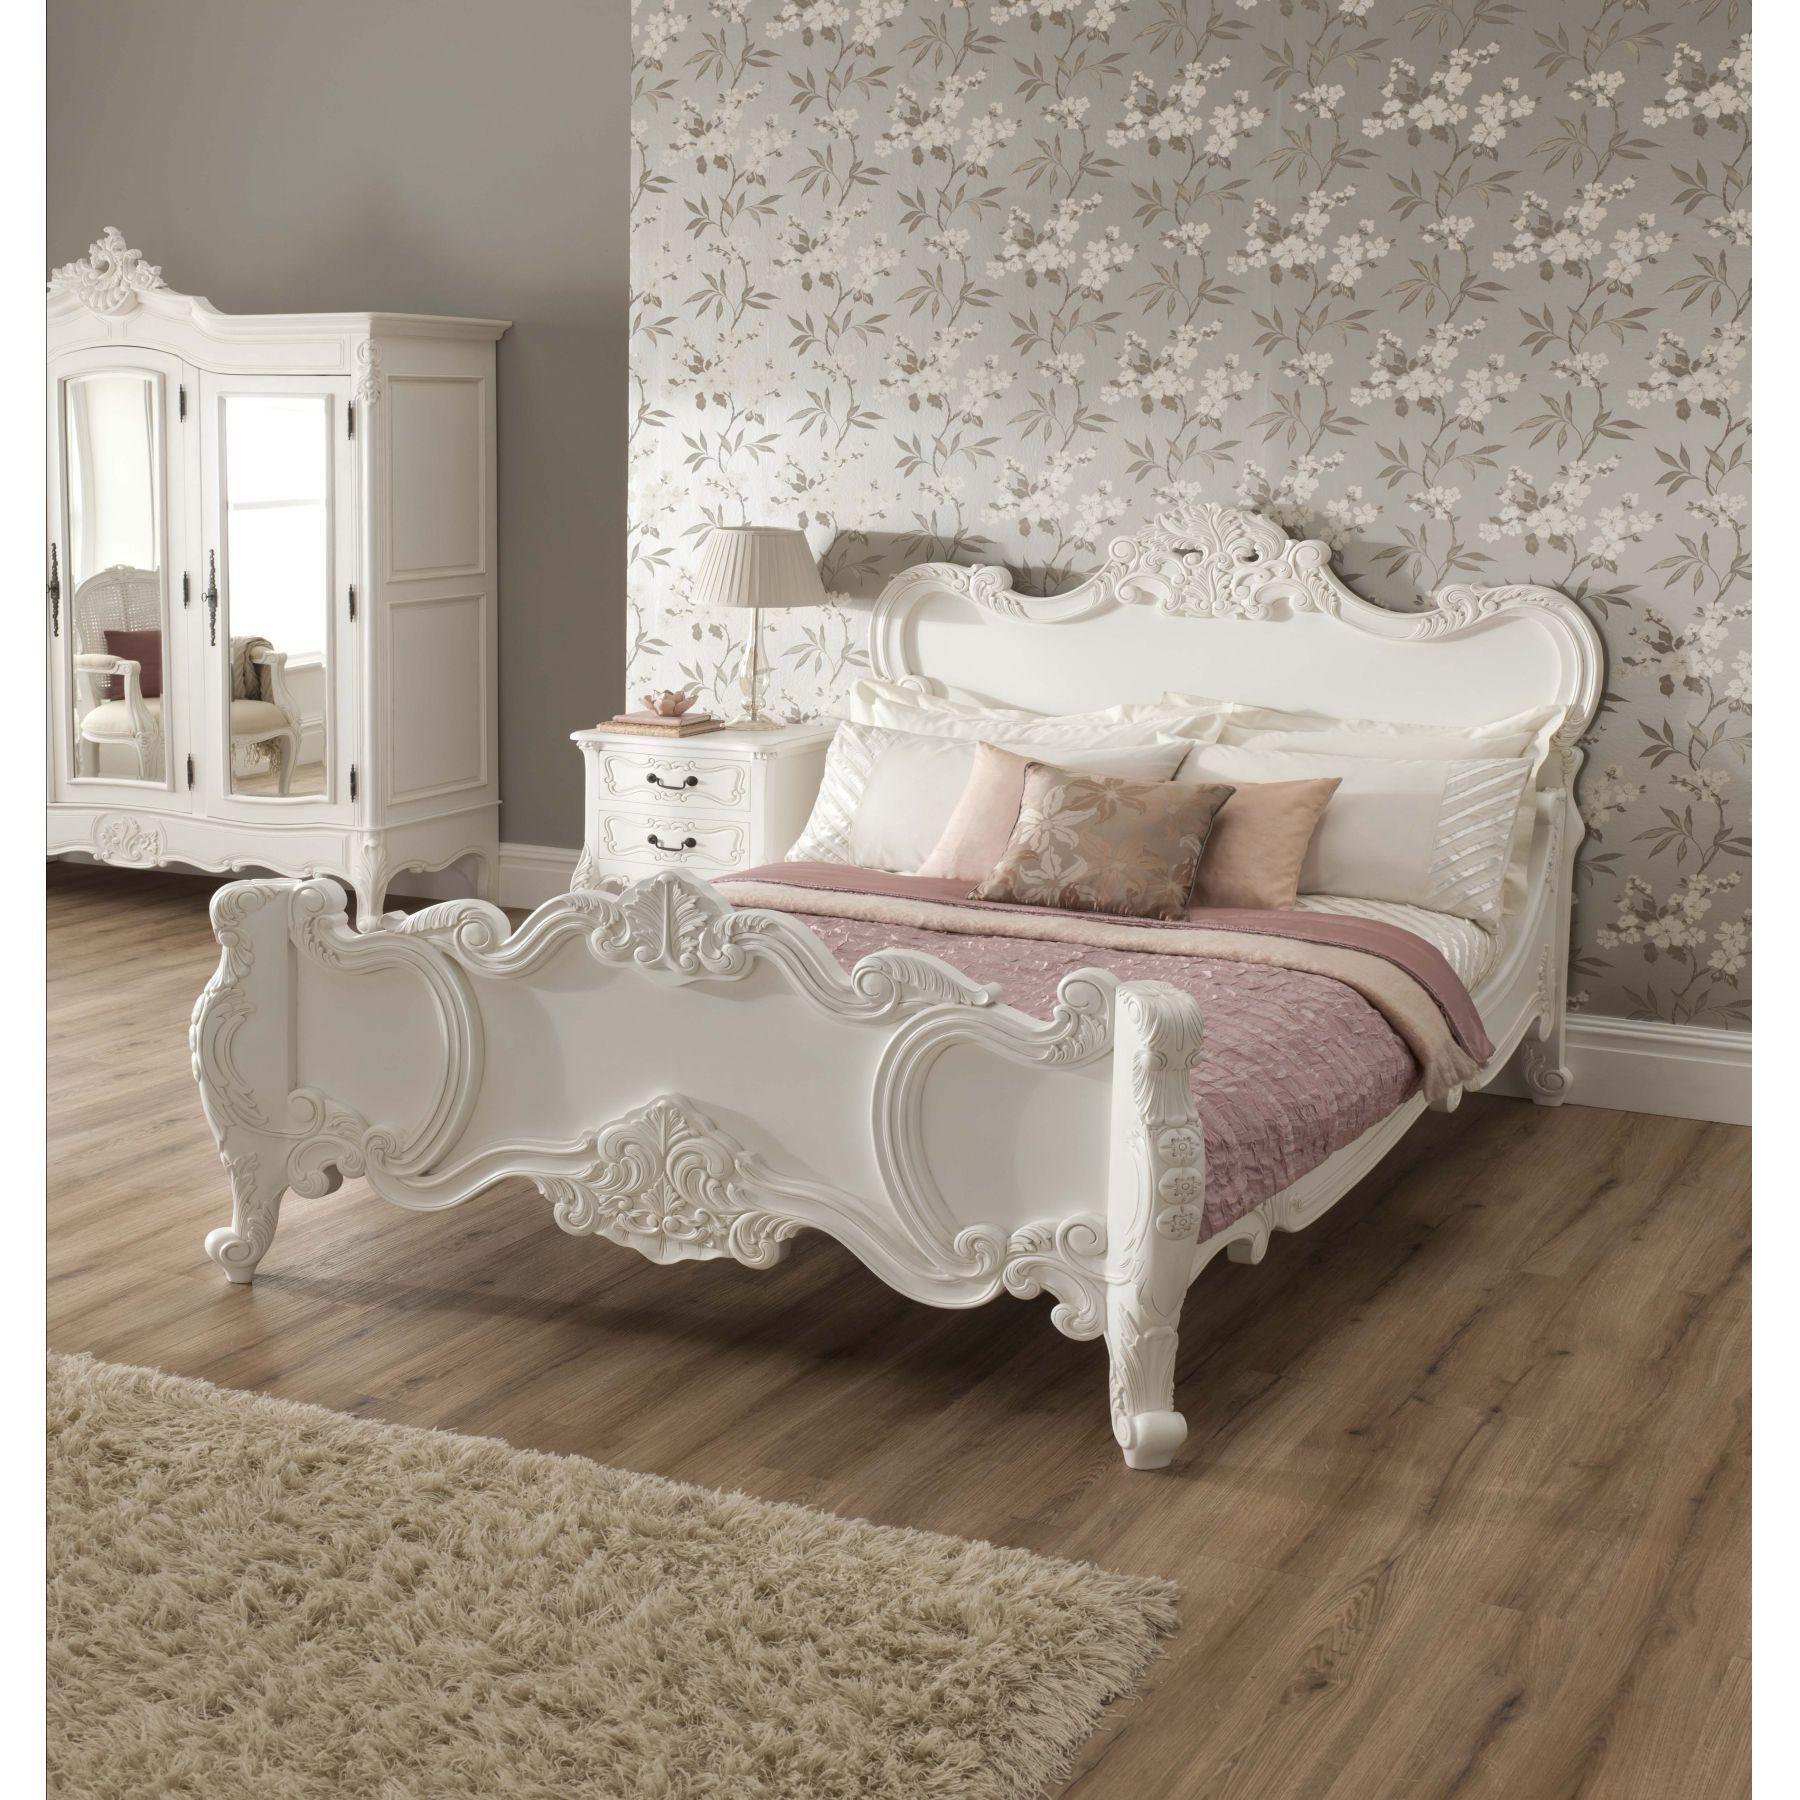 Schlafzimmer Vintage Style schlafzimmer ideen потертый chic 5 shabby chic shabby